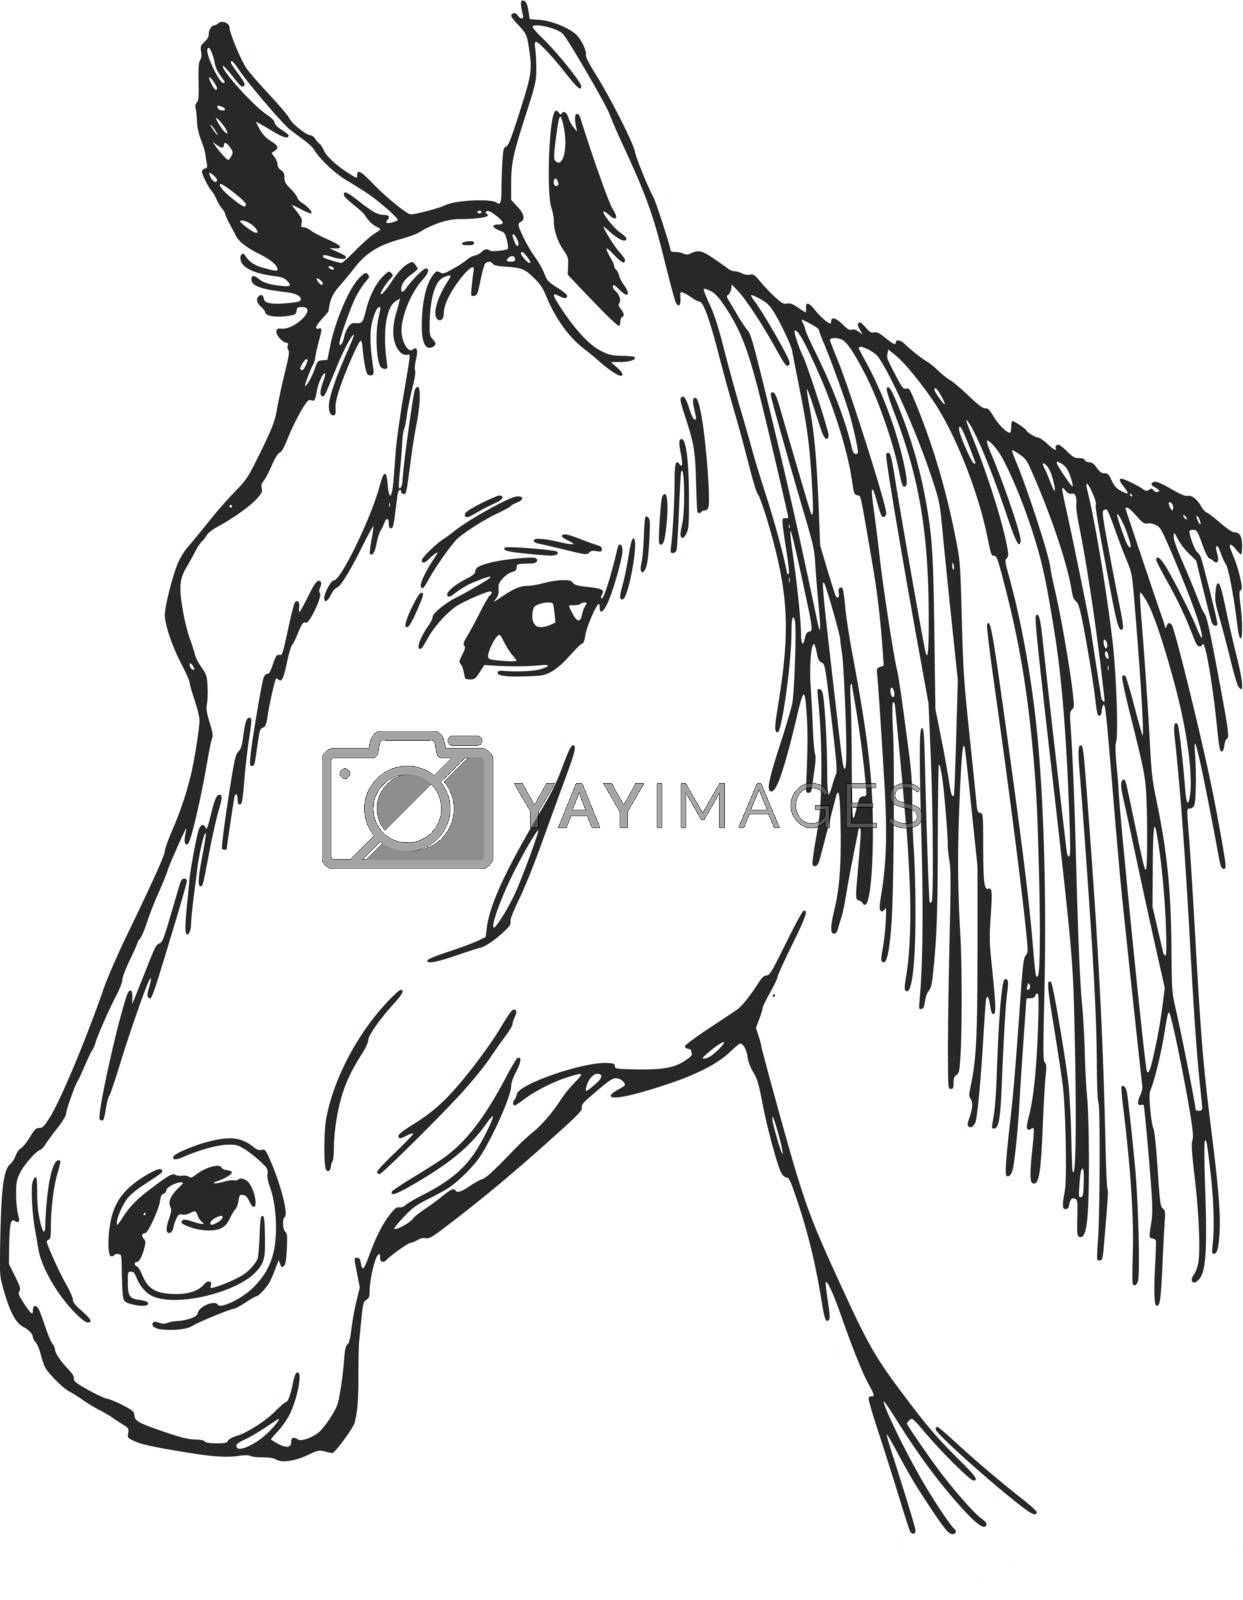 hand drawn, sketch, cartoon illustration of head of horse